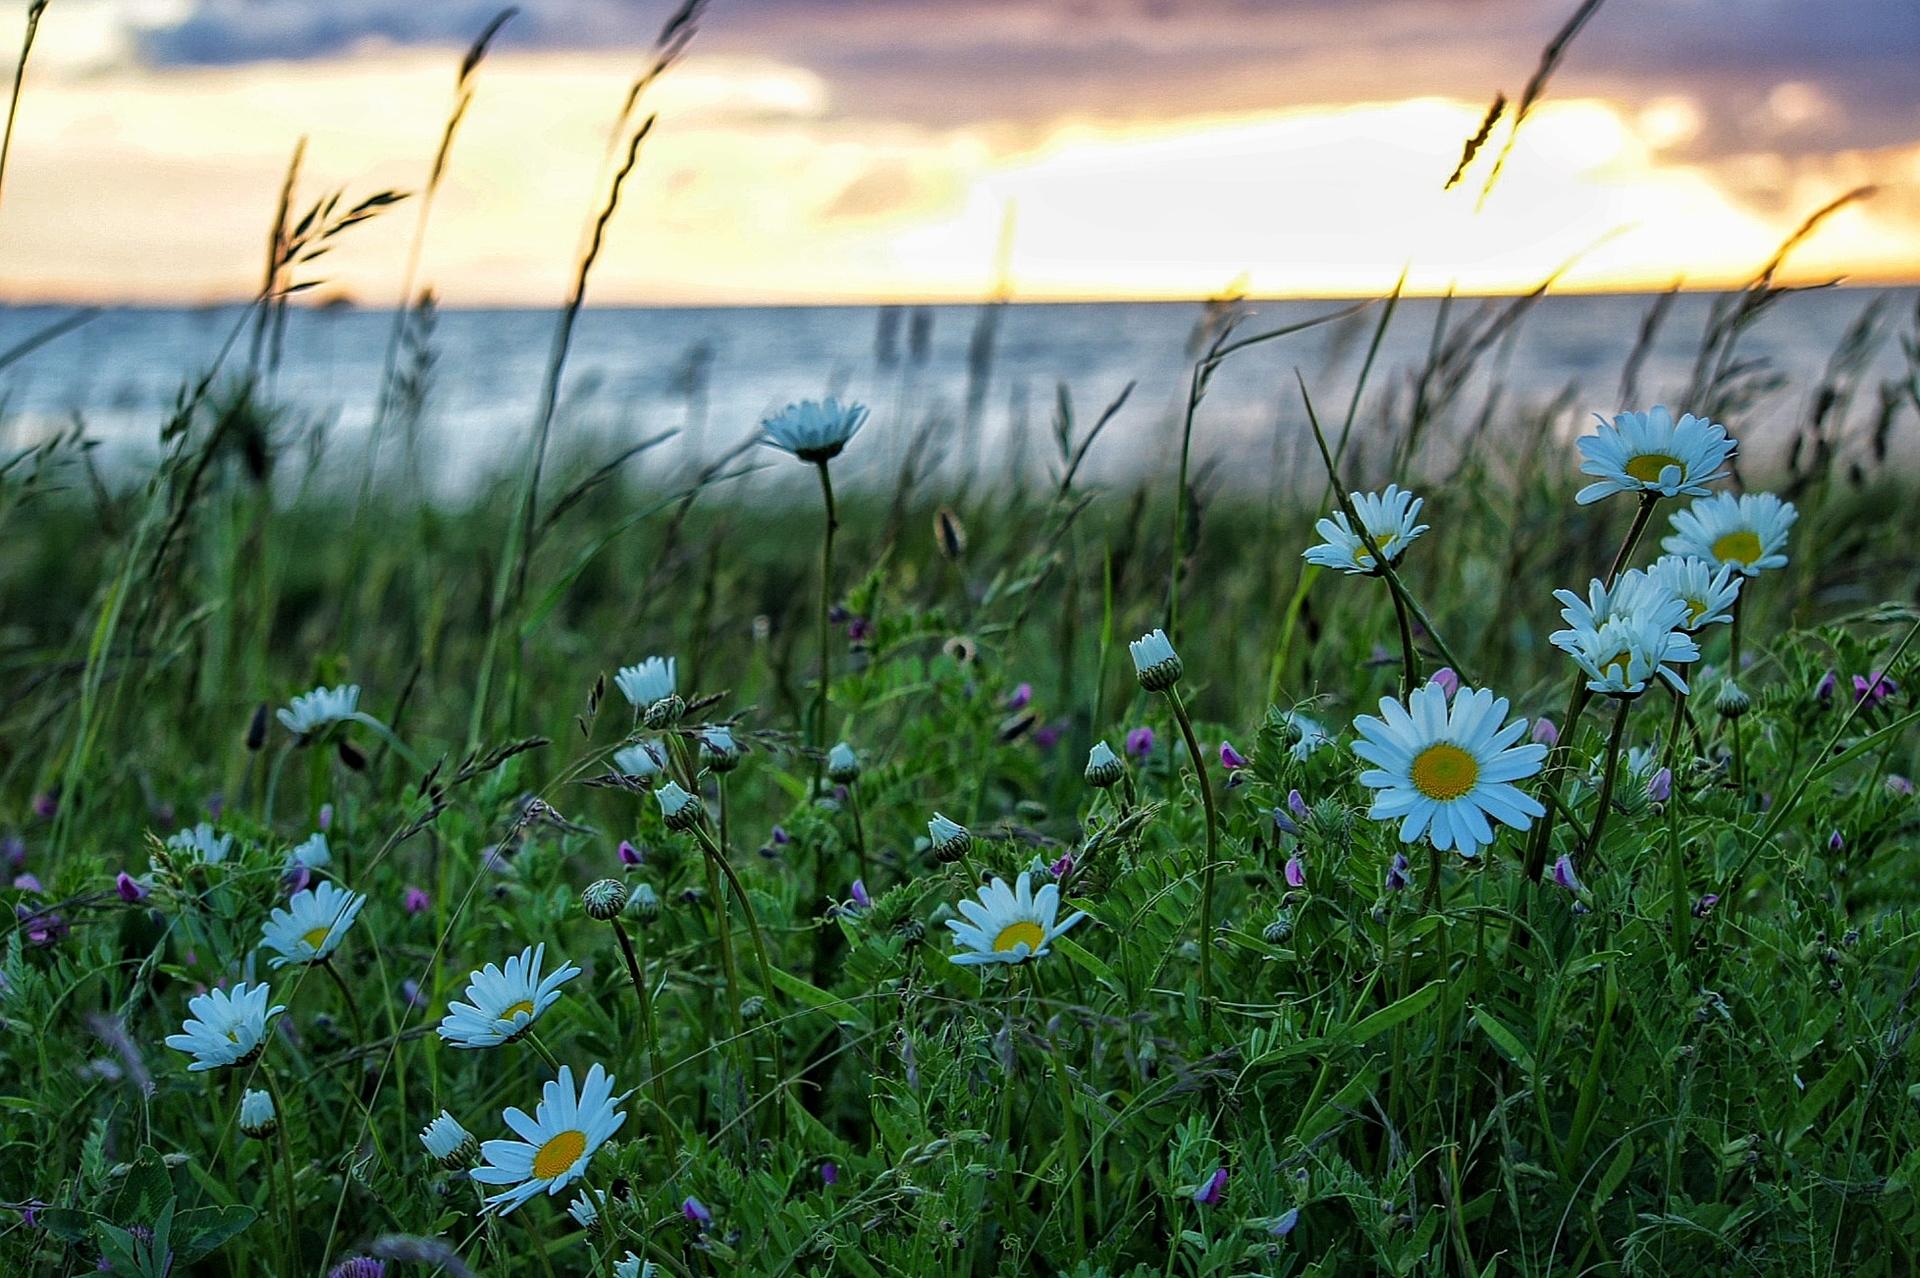 field | hayfield, flower, grass, summer